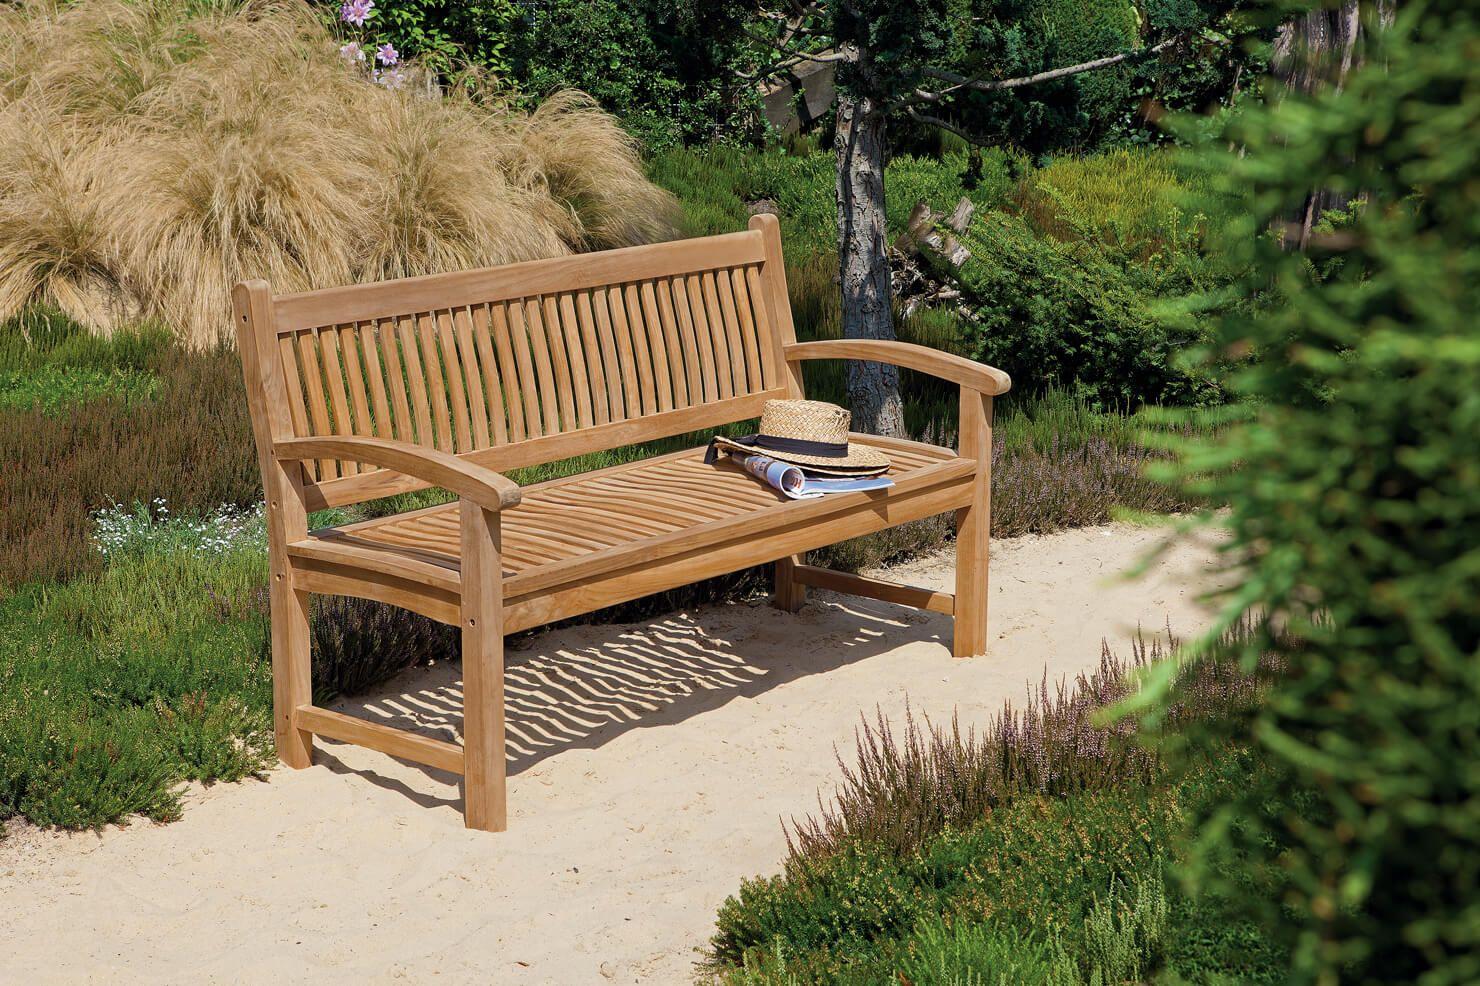 Gartenbank Fortuna aus Bangkirai, versch. Breiten | Mobiliar und ...